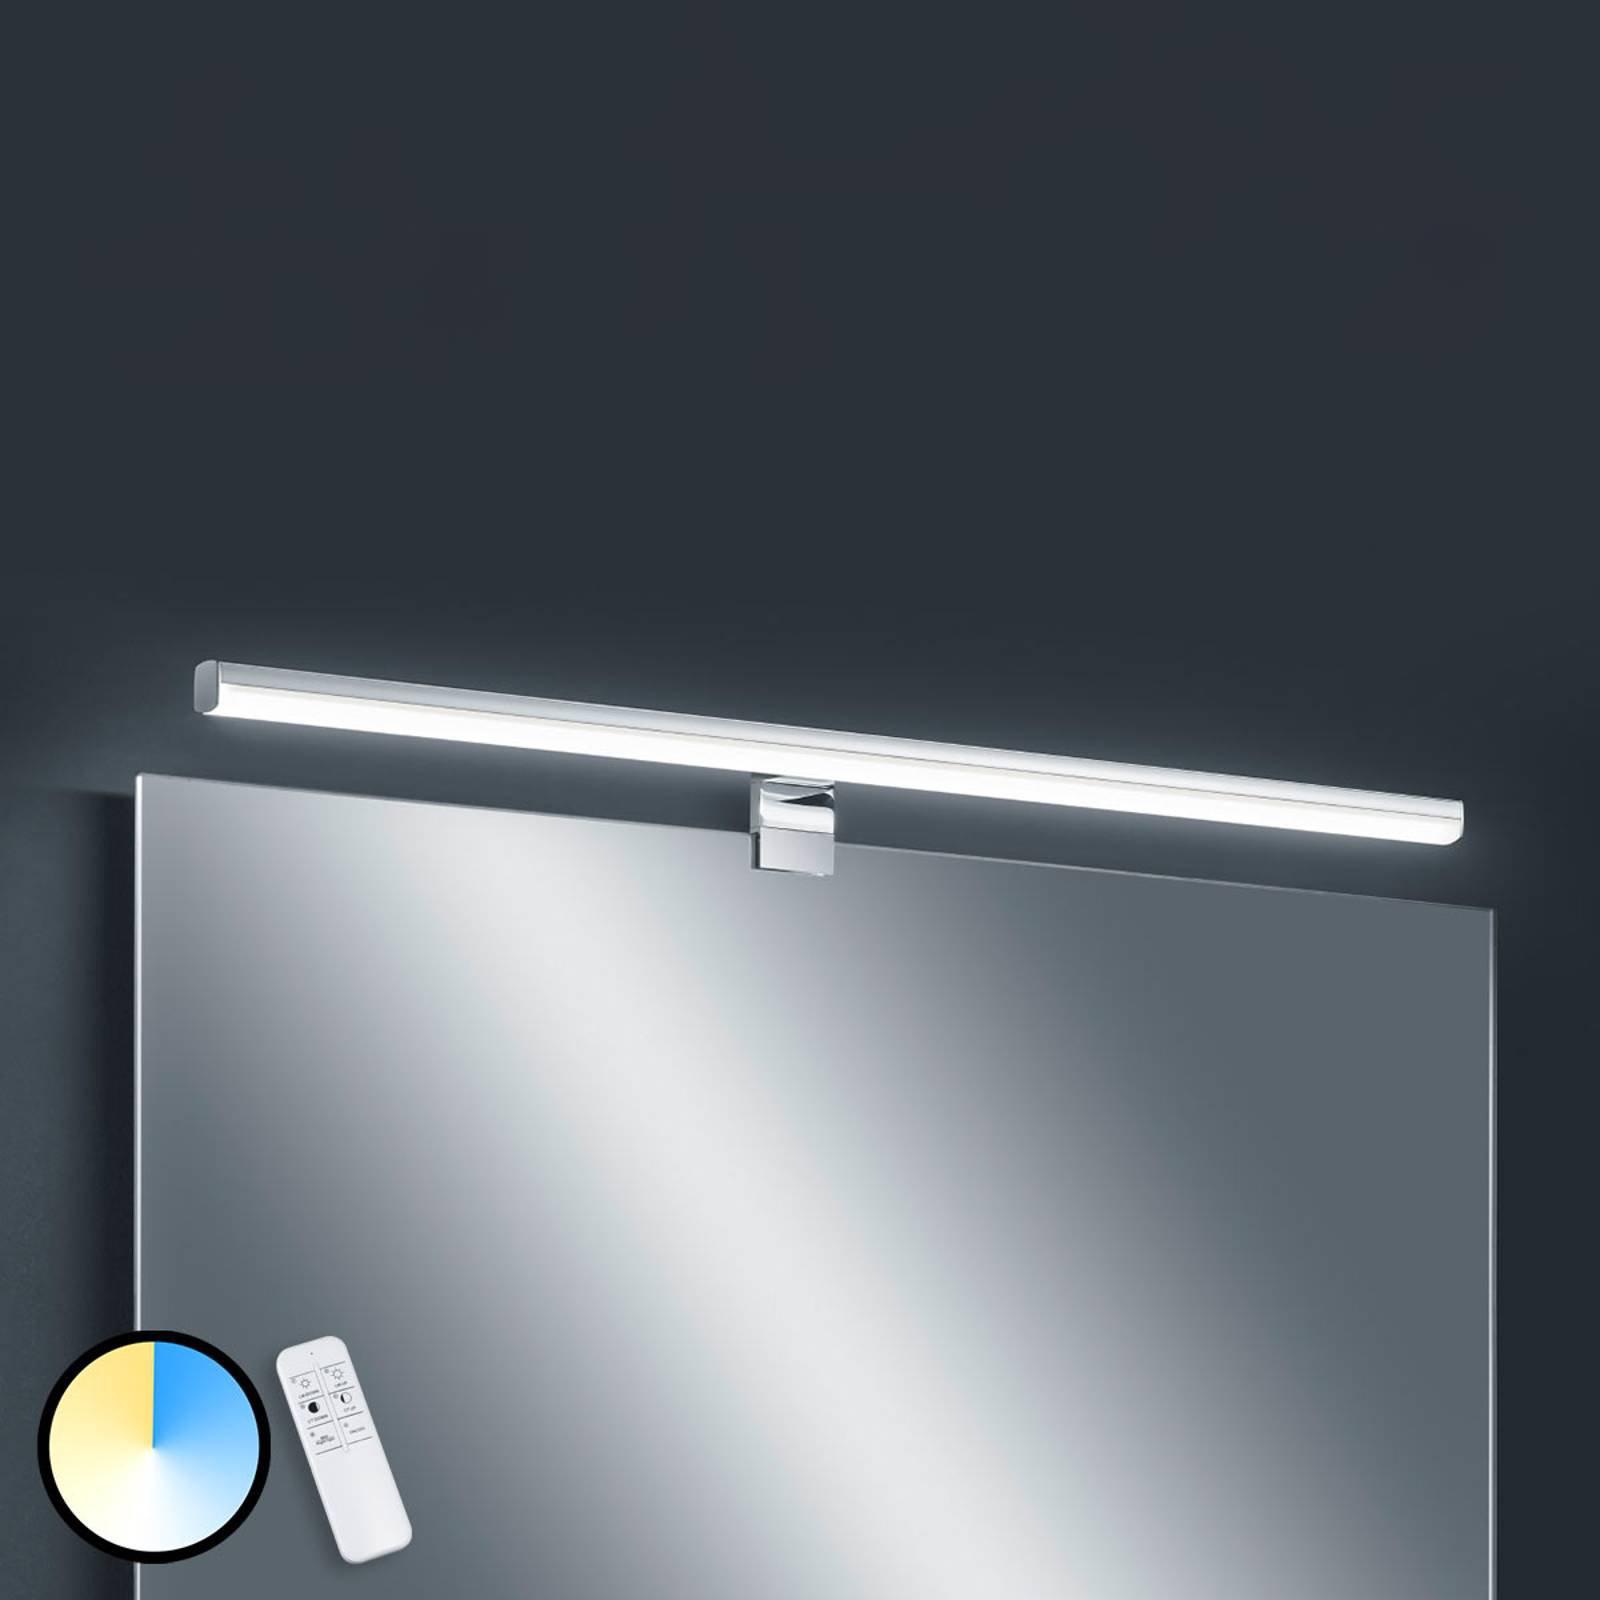 Helestra Gaia LED-speillampe fjernkontroll 79 cm